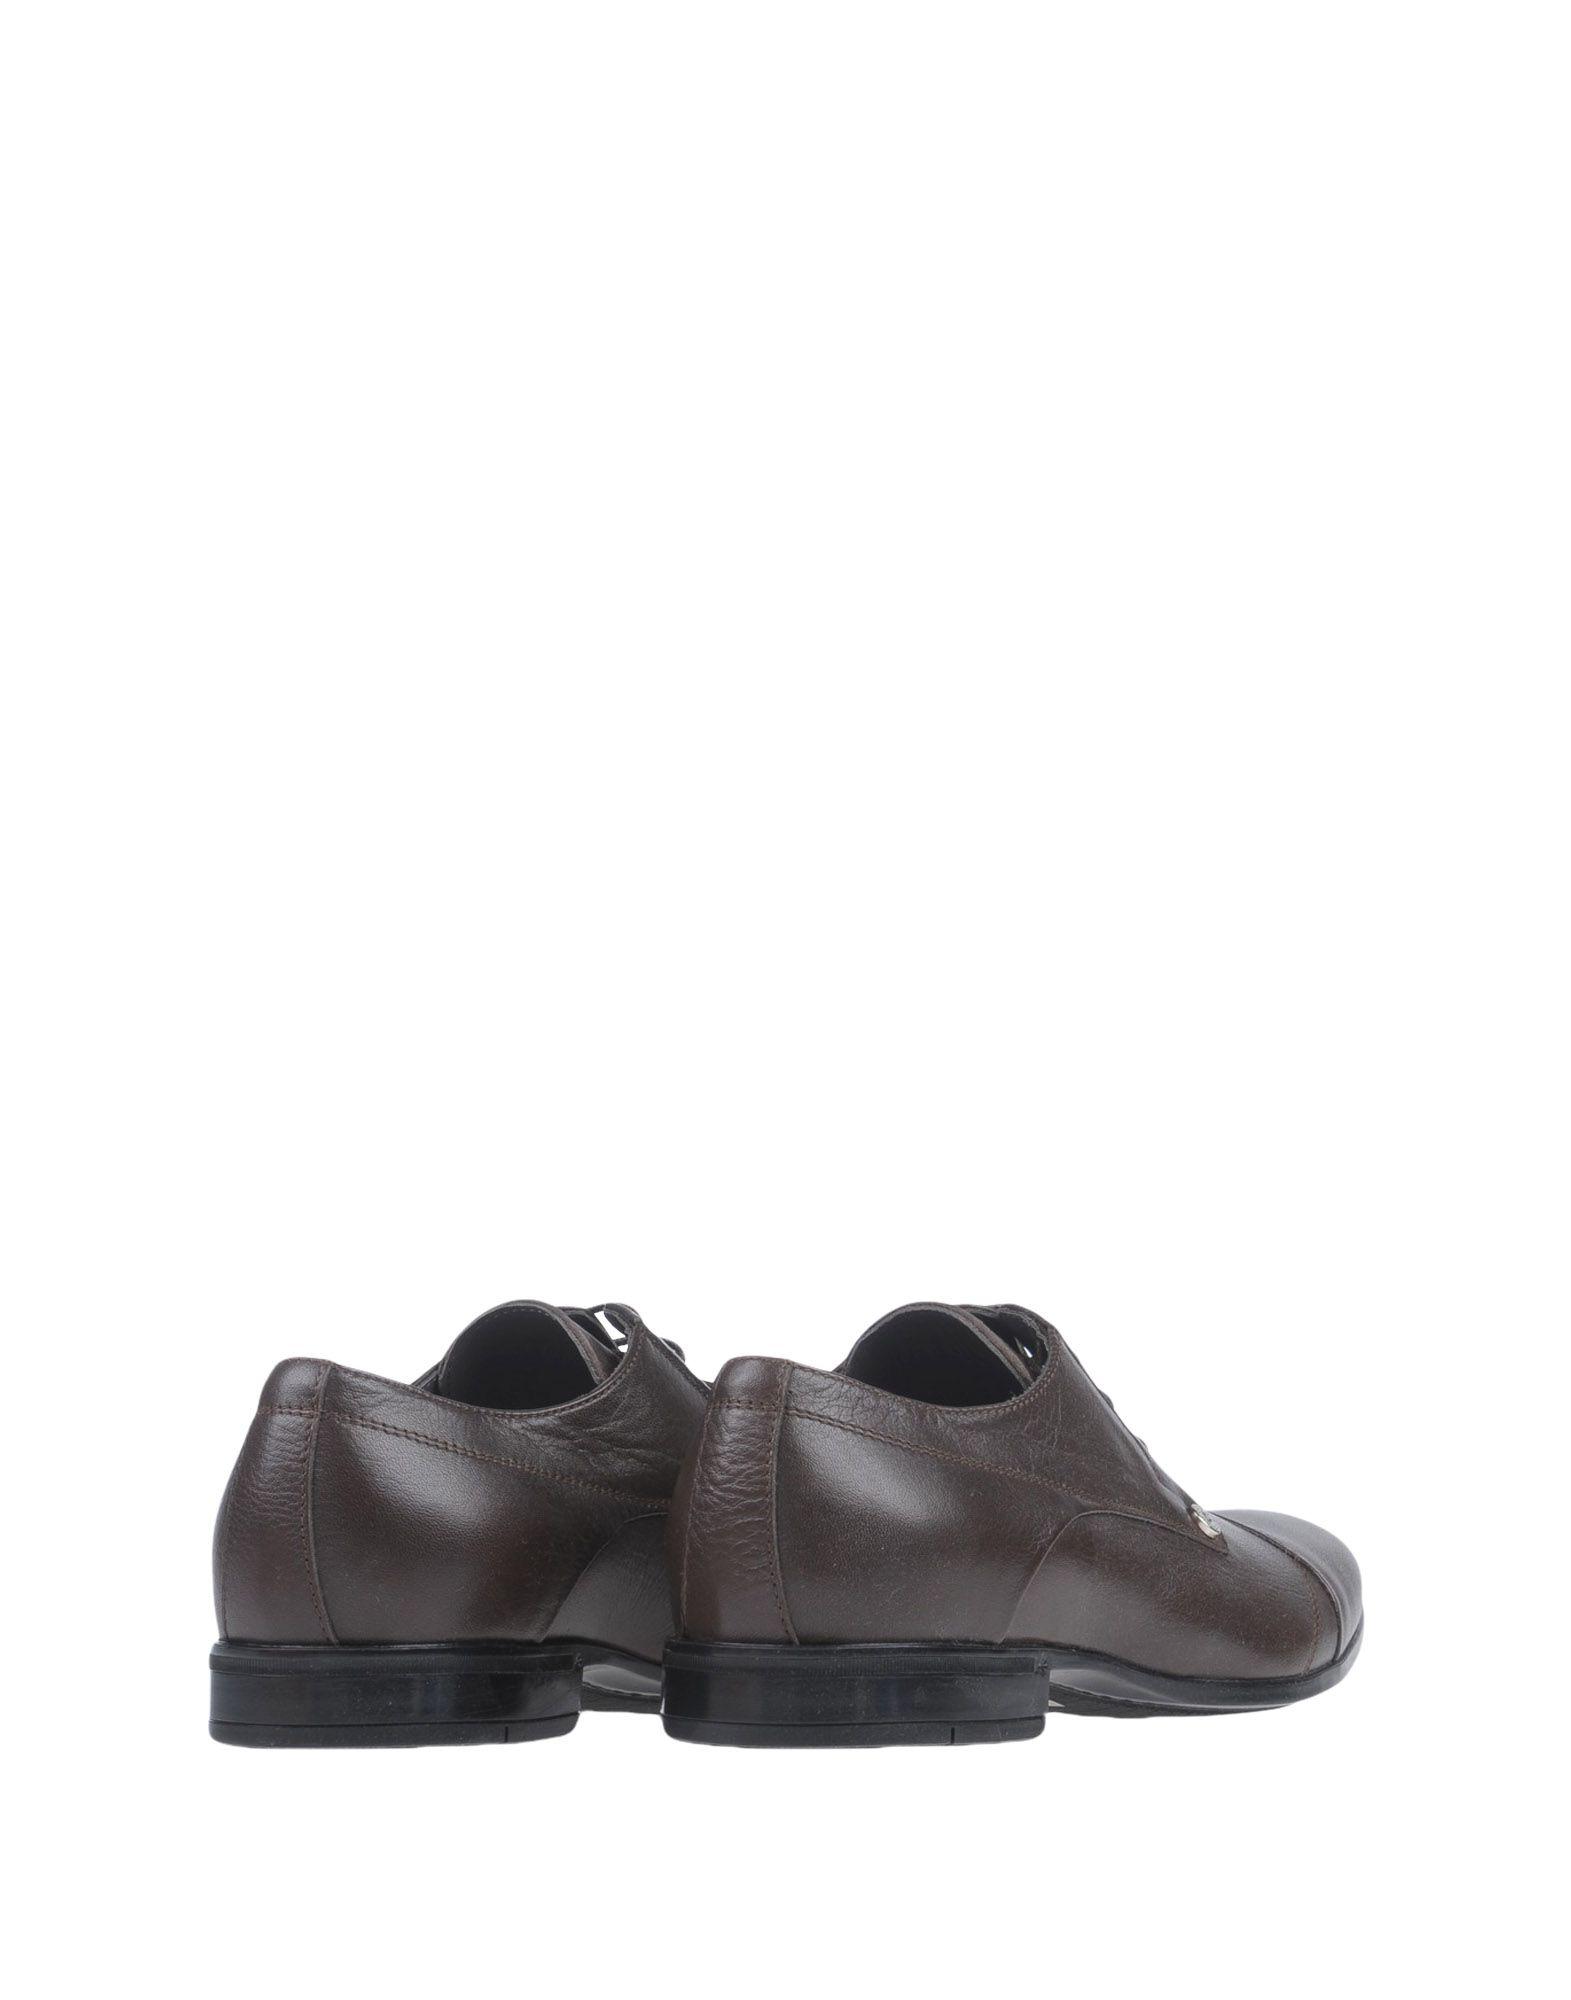 Pollini Schnürschuhe Herren  11331366MM Heiße Schuhe Schuhe Schuhe 42c380